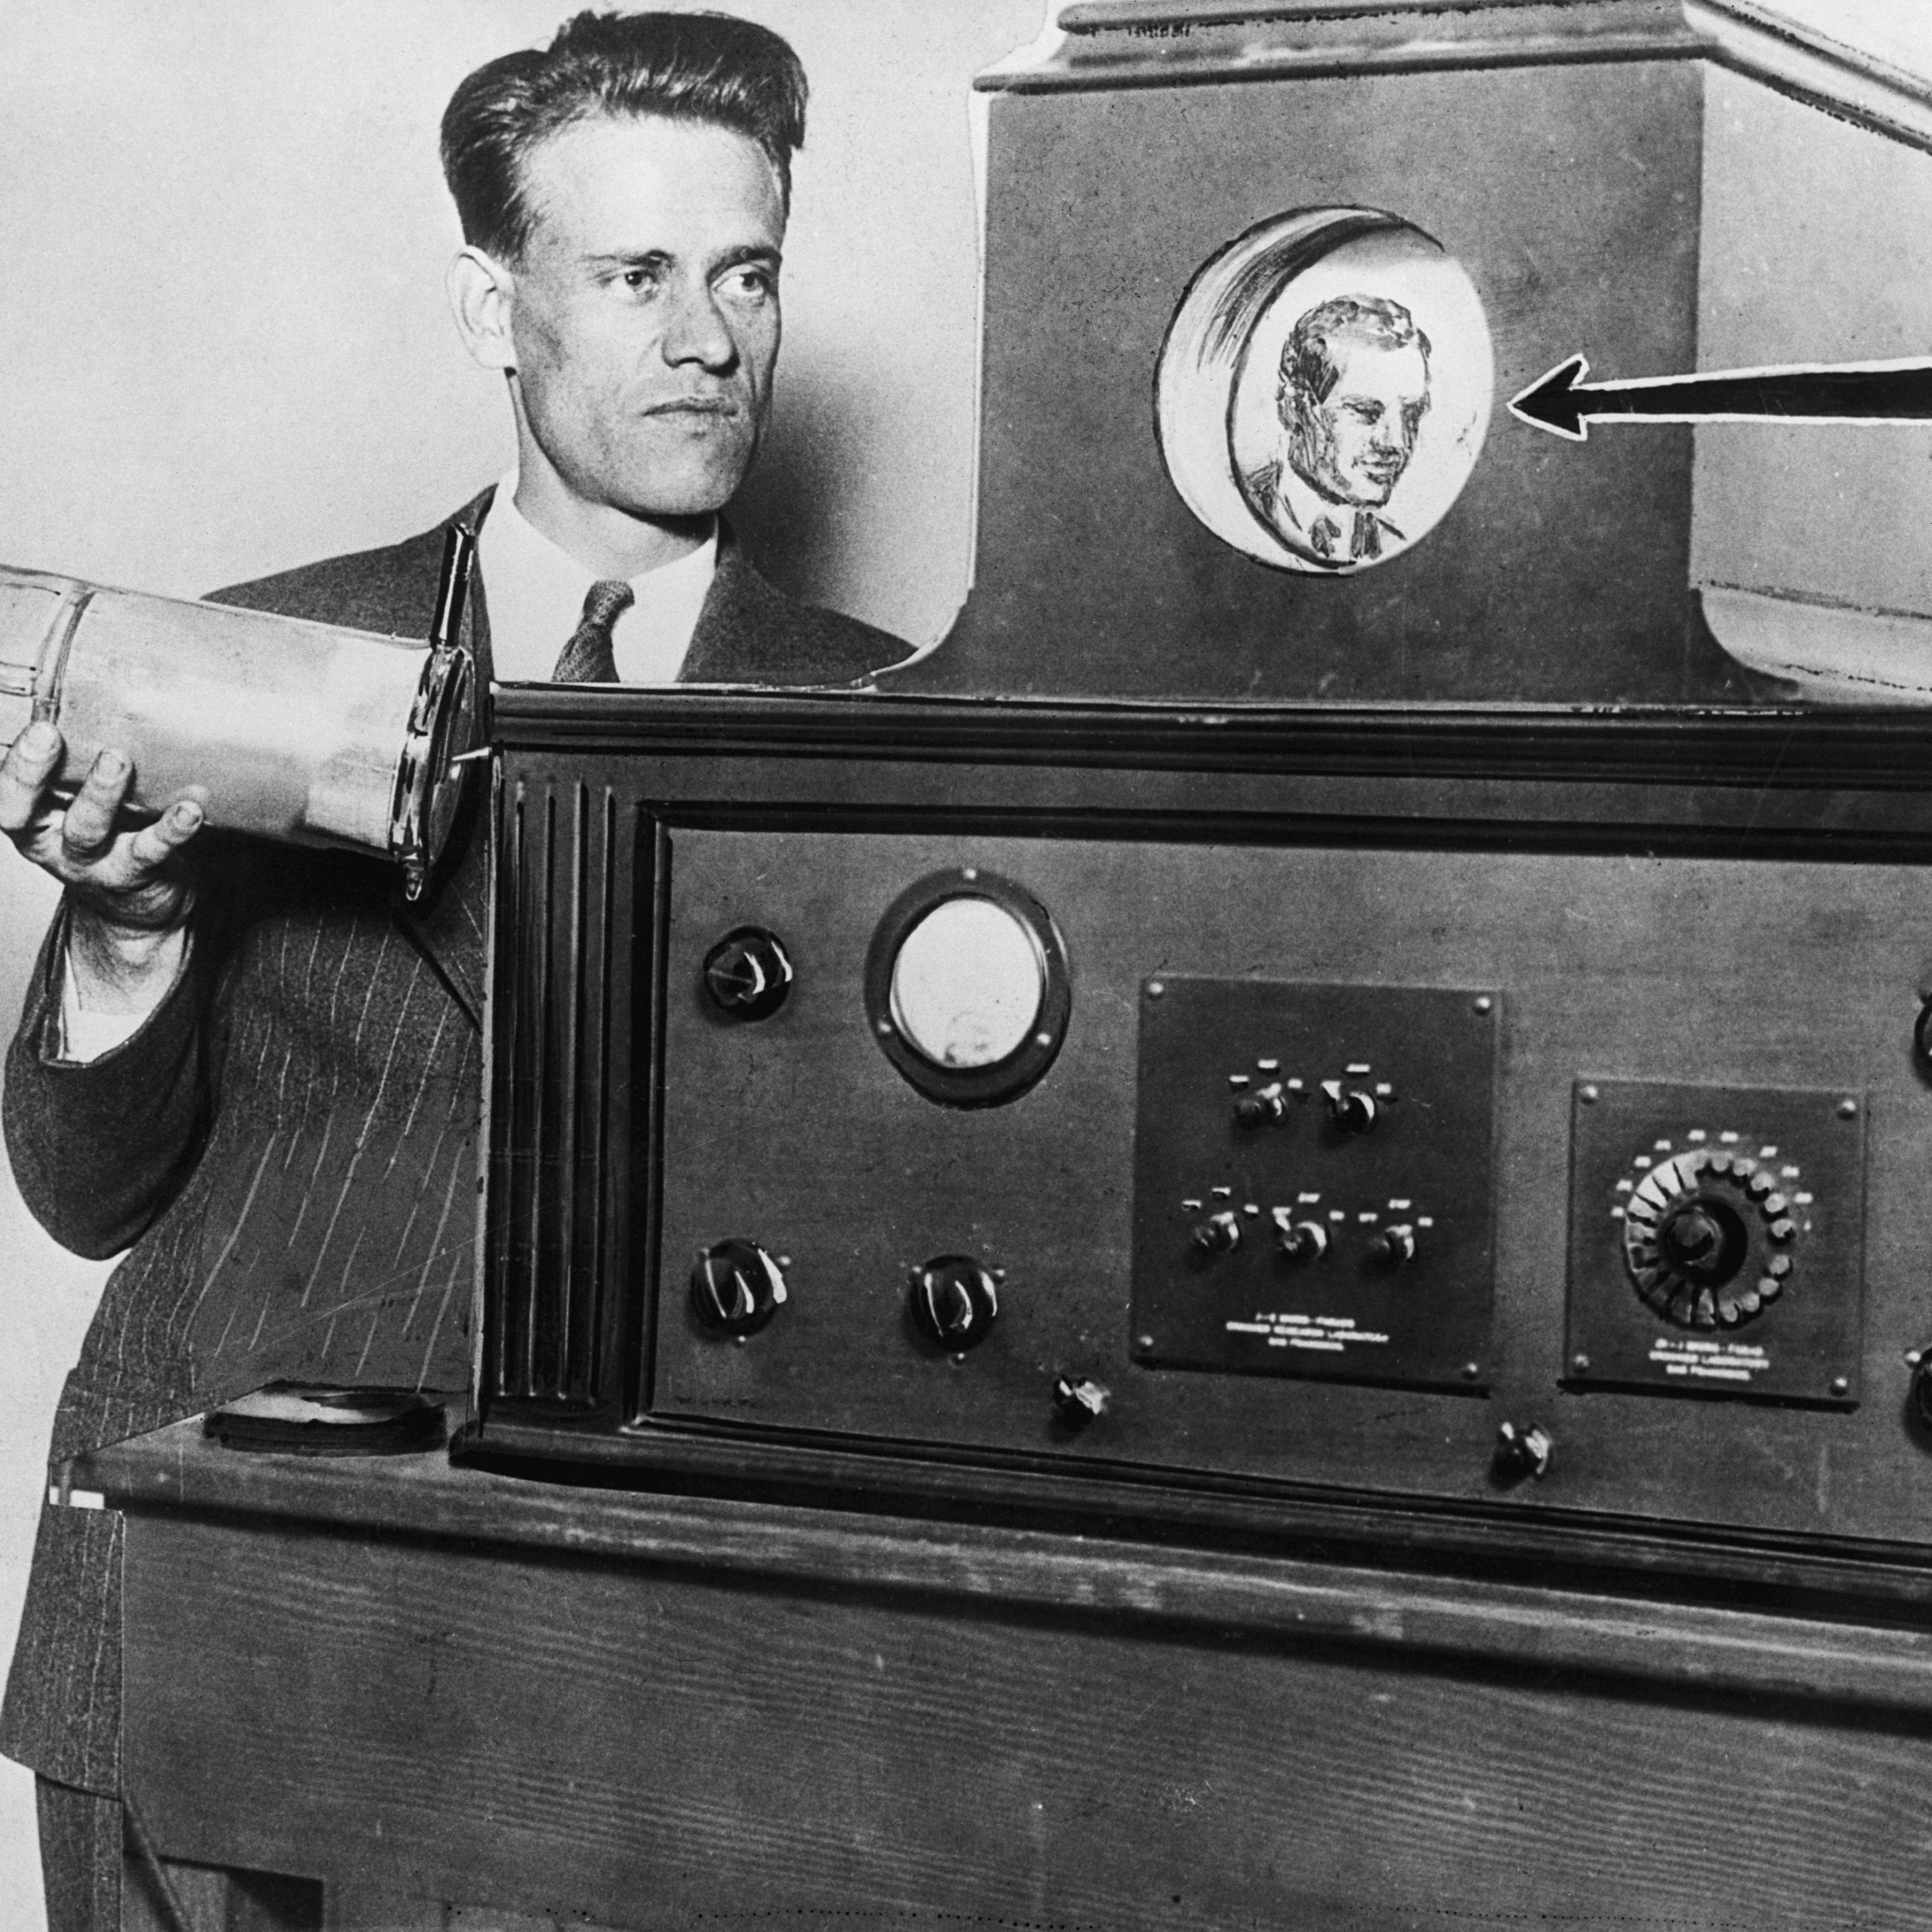 Biography of Philo Farnsworth, American Inventor